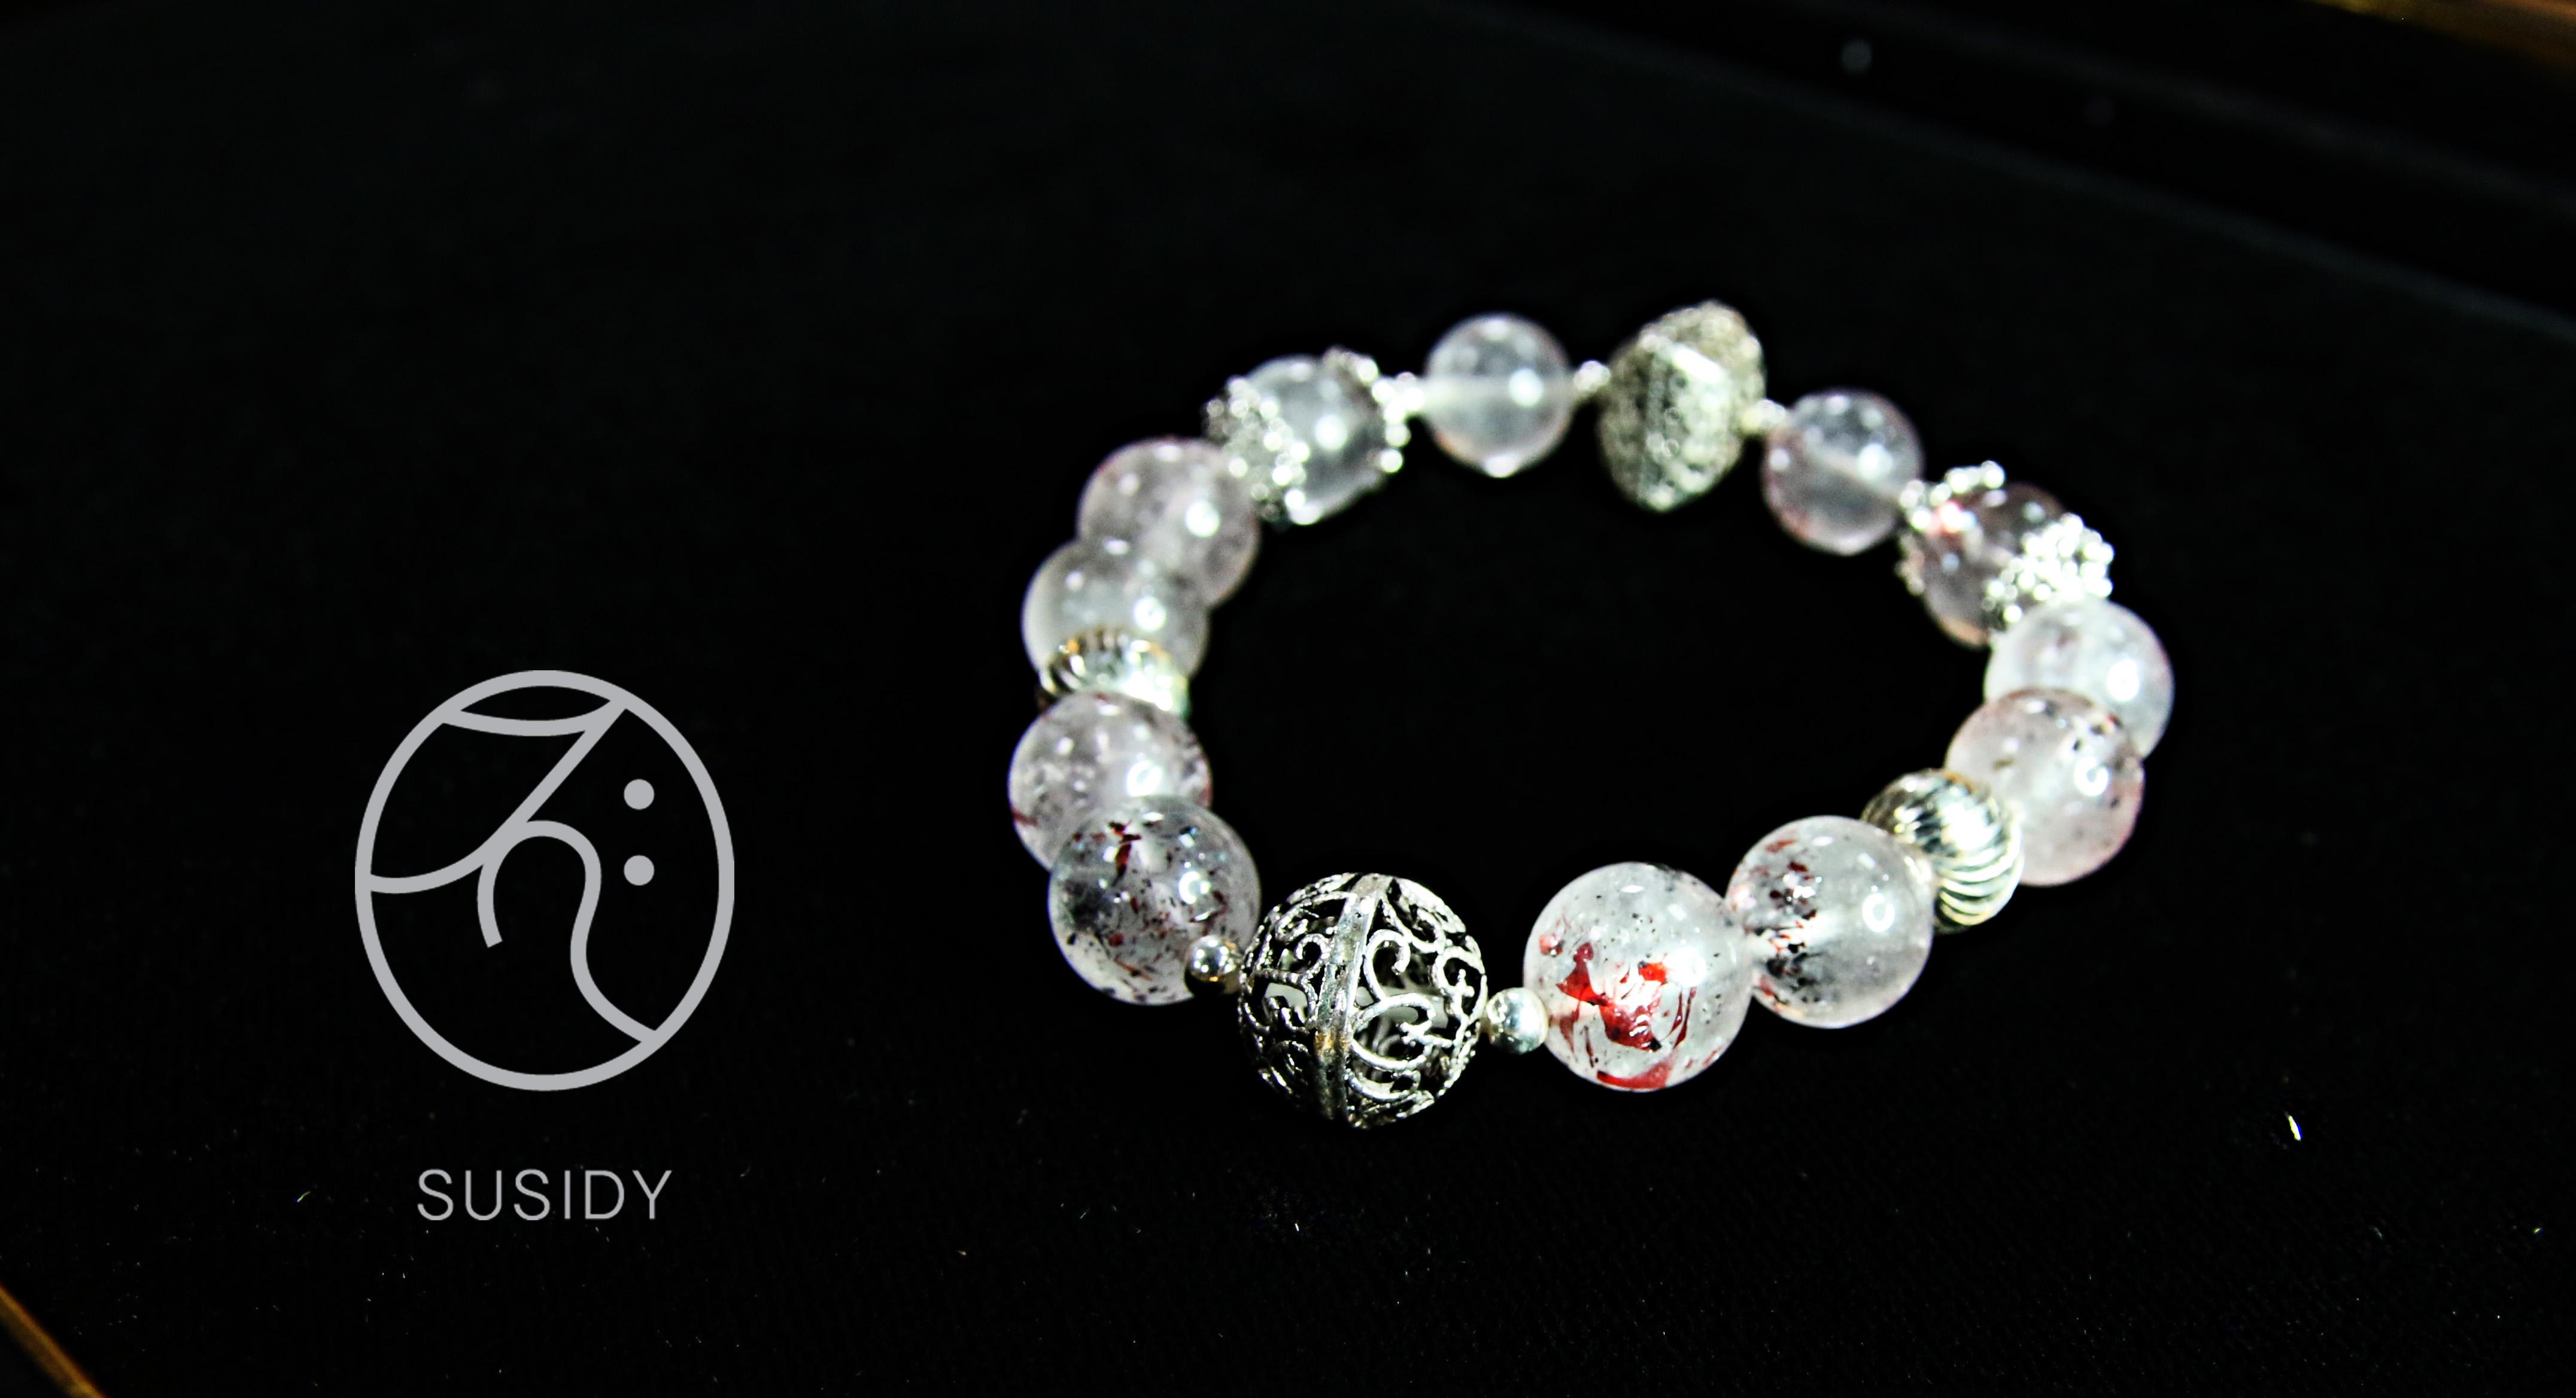 SusidyDesign -  超級七 Superseven 手珠 銀飾